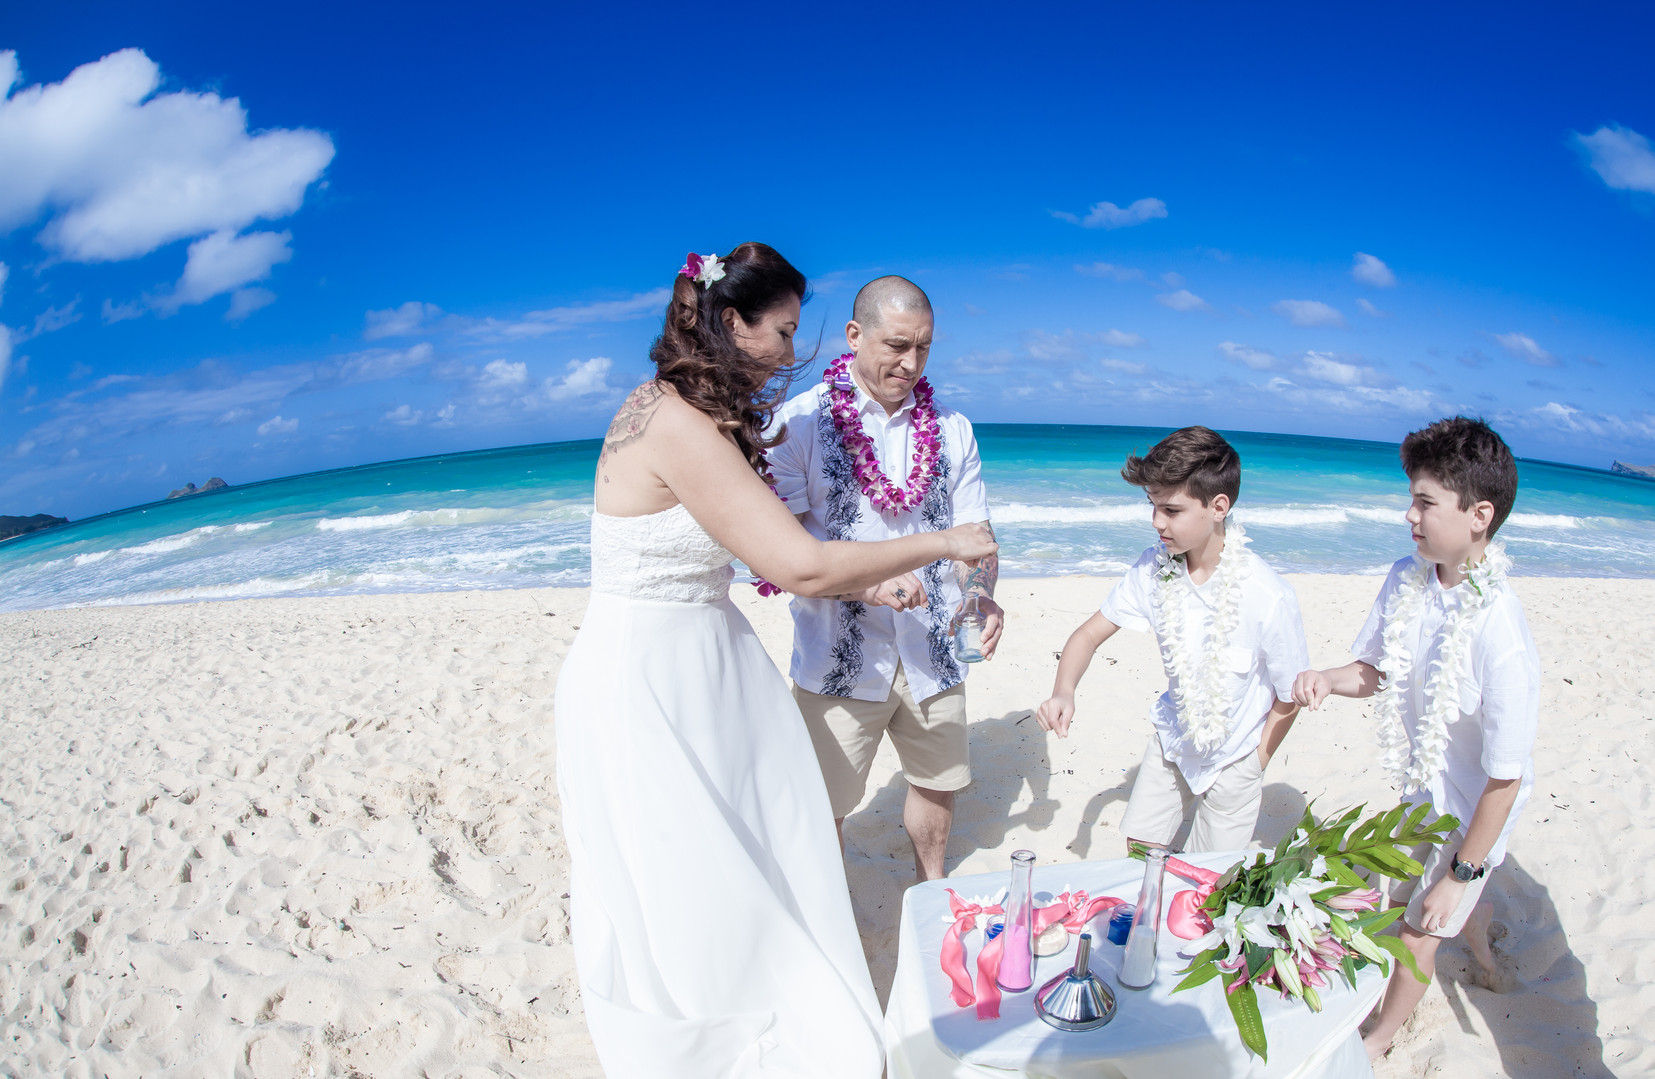 Wedding-picture-2-24.jpg